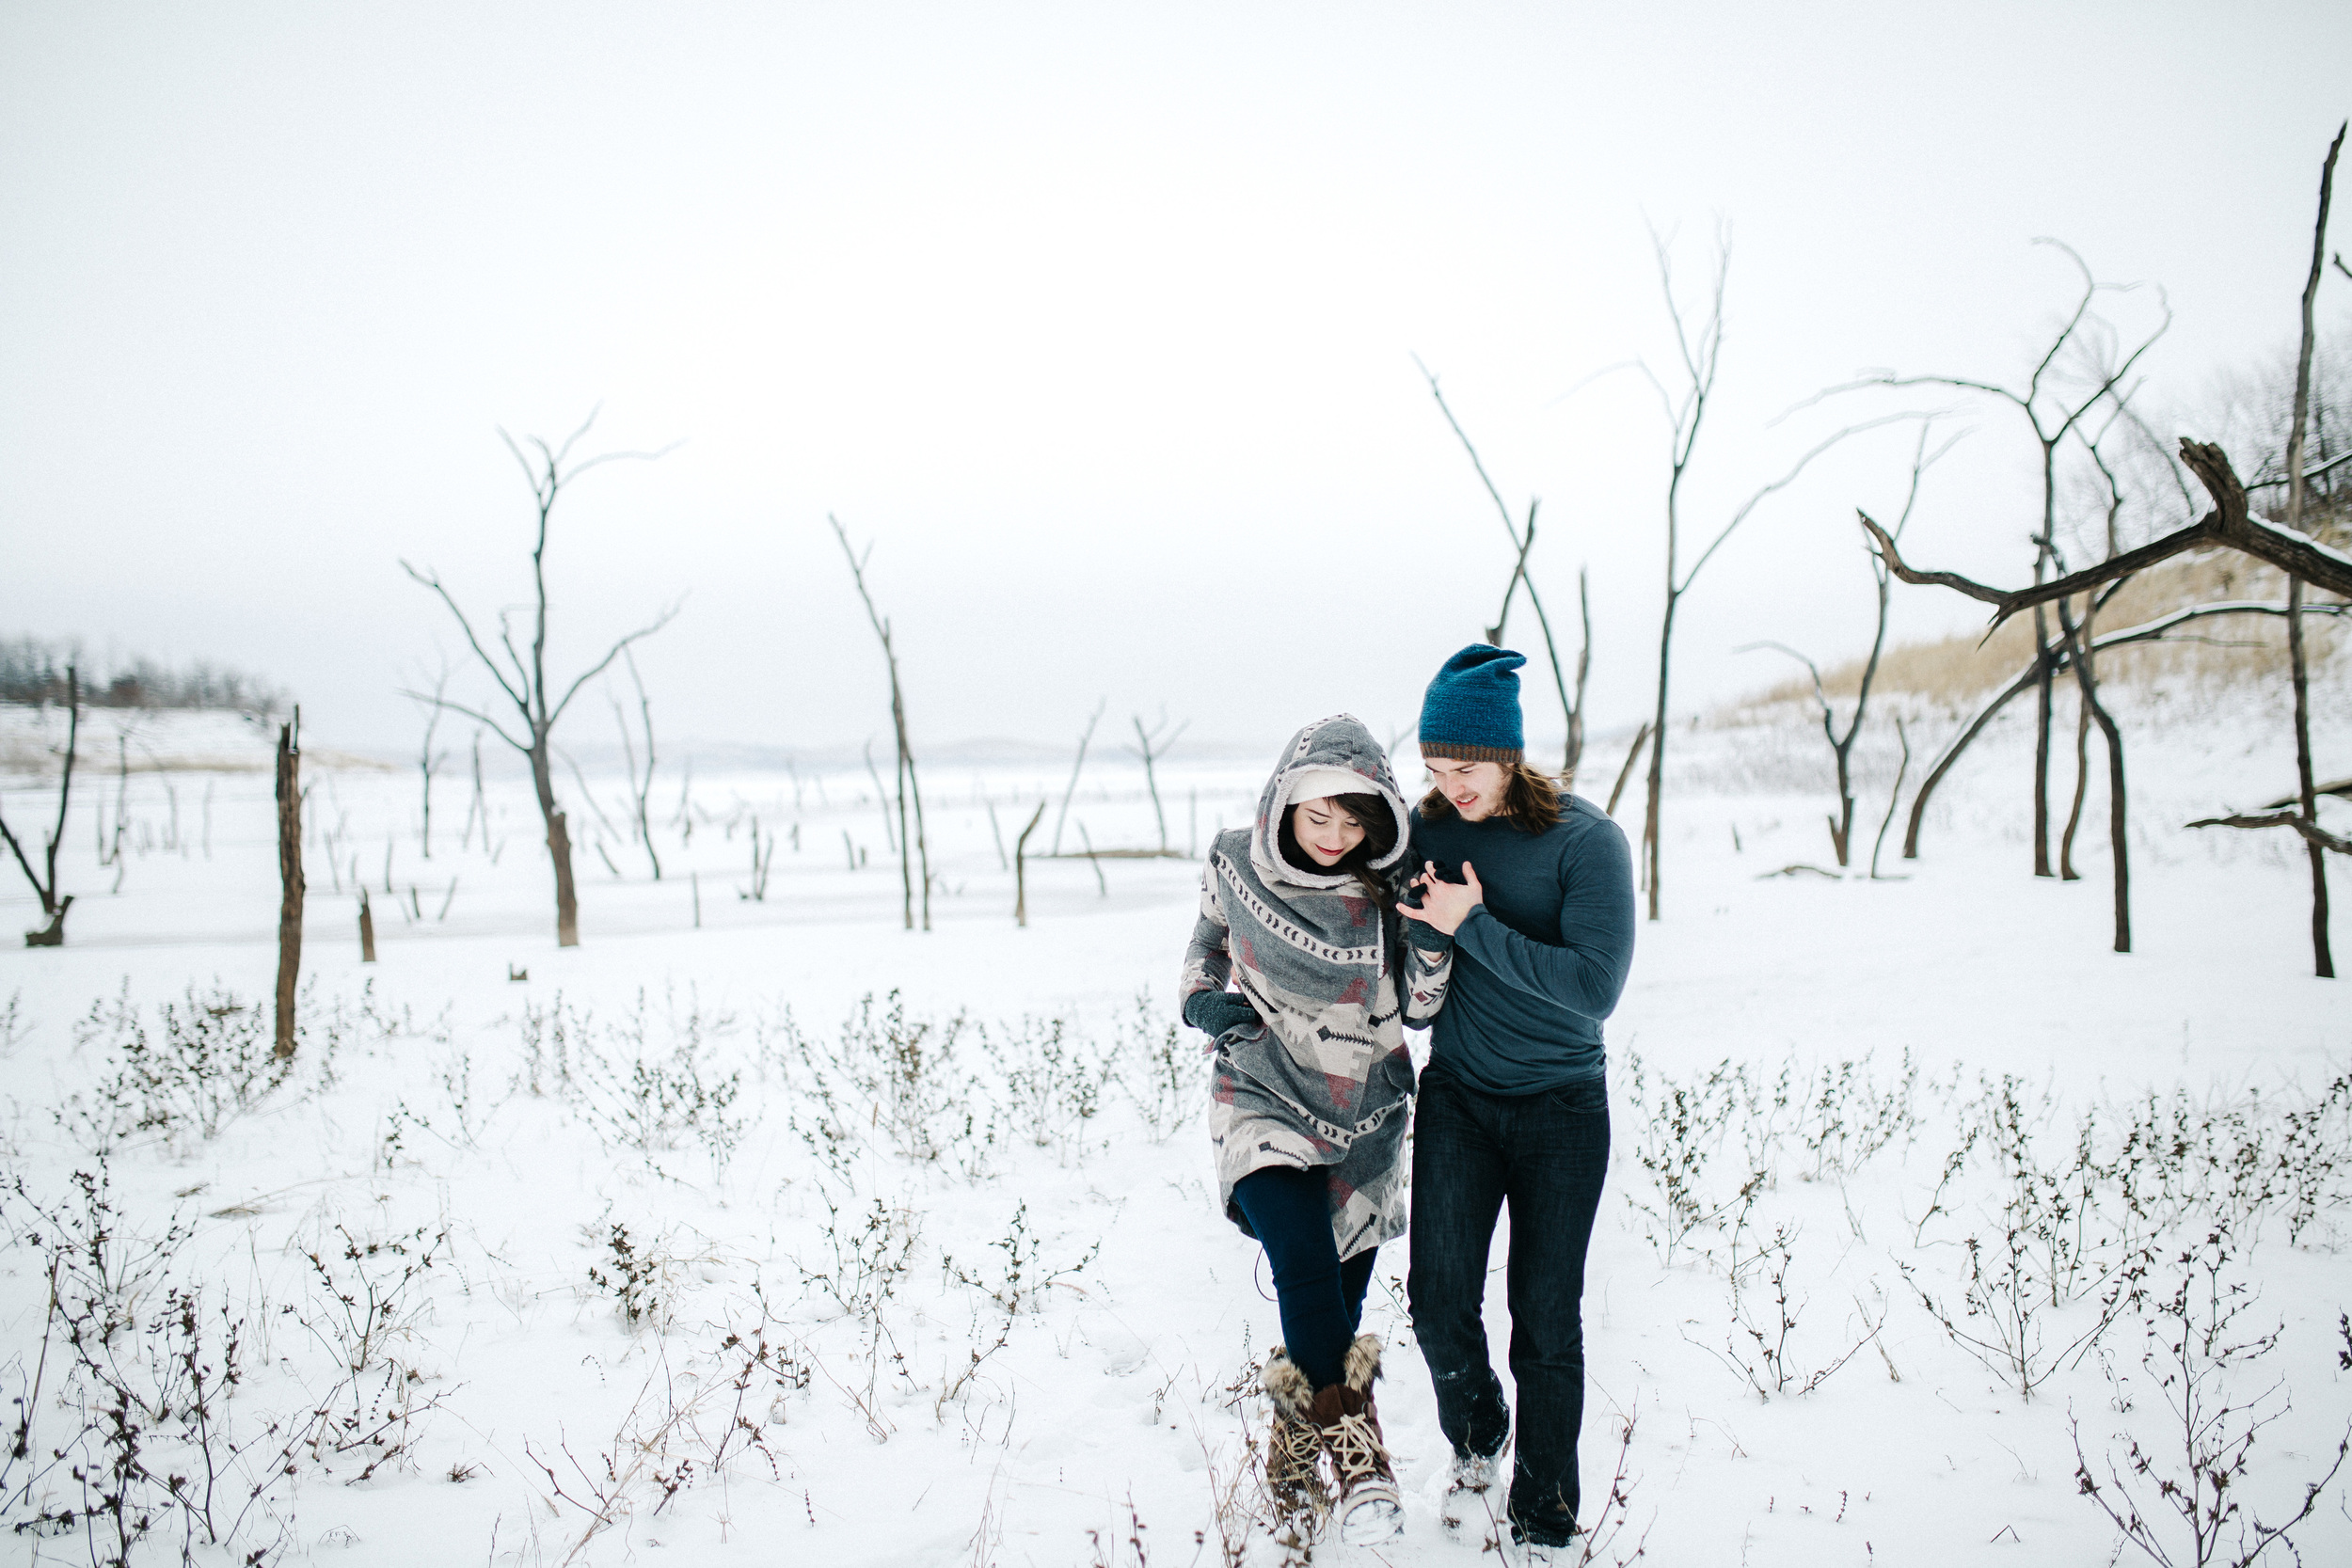 snow+m+o+d+e+l+s-104.jpg